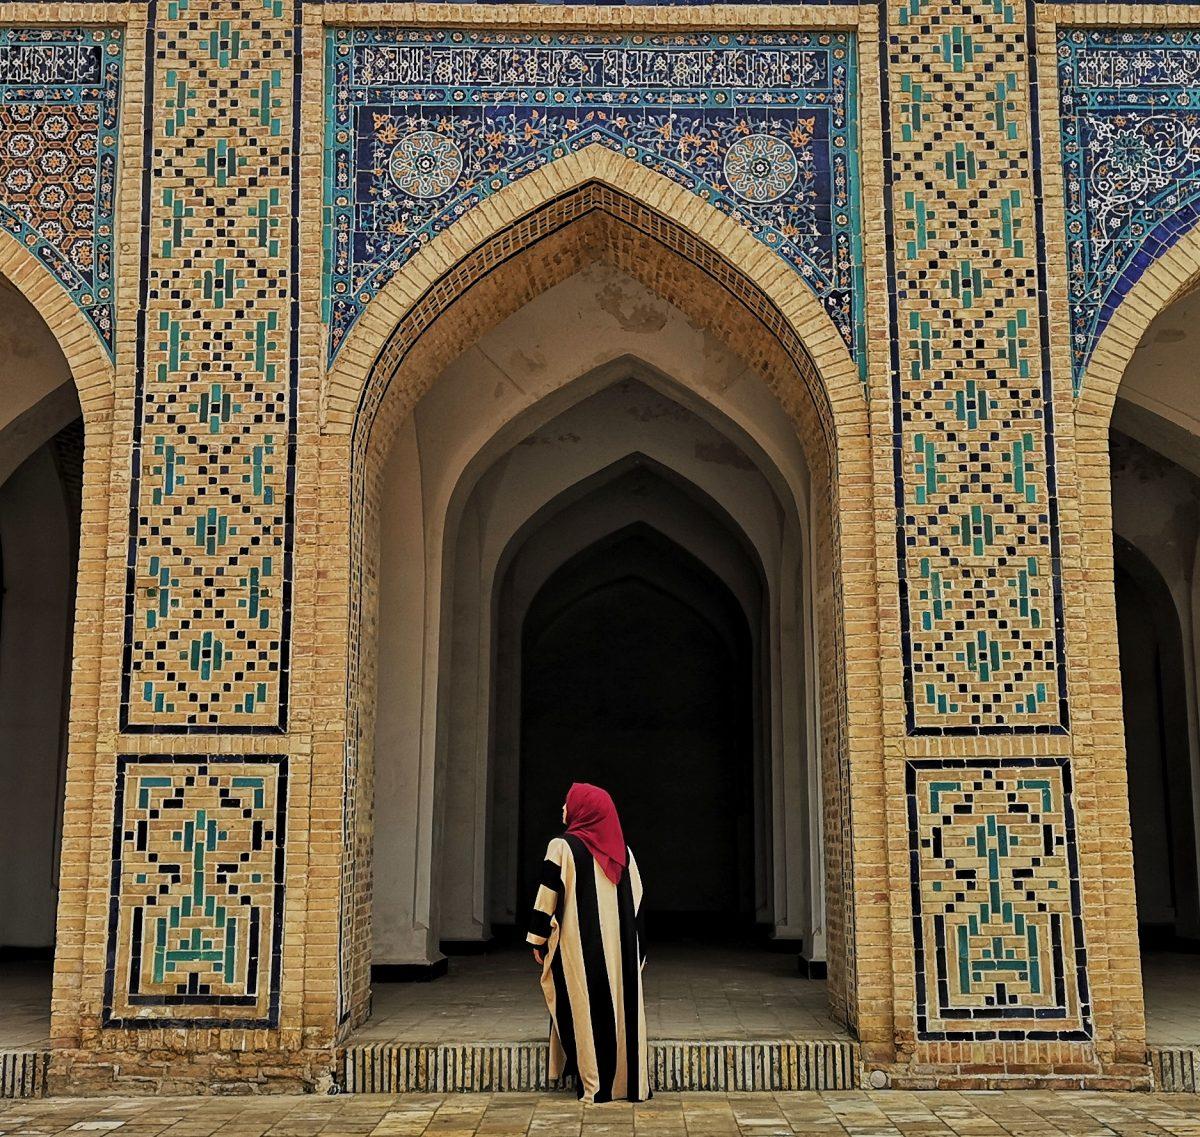 Muslim woman in red hedscarf and abaya in Uzbekistan